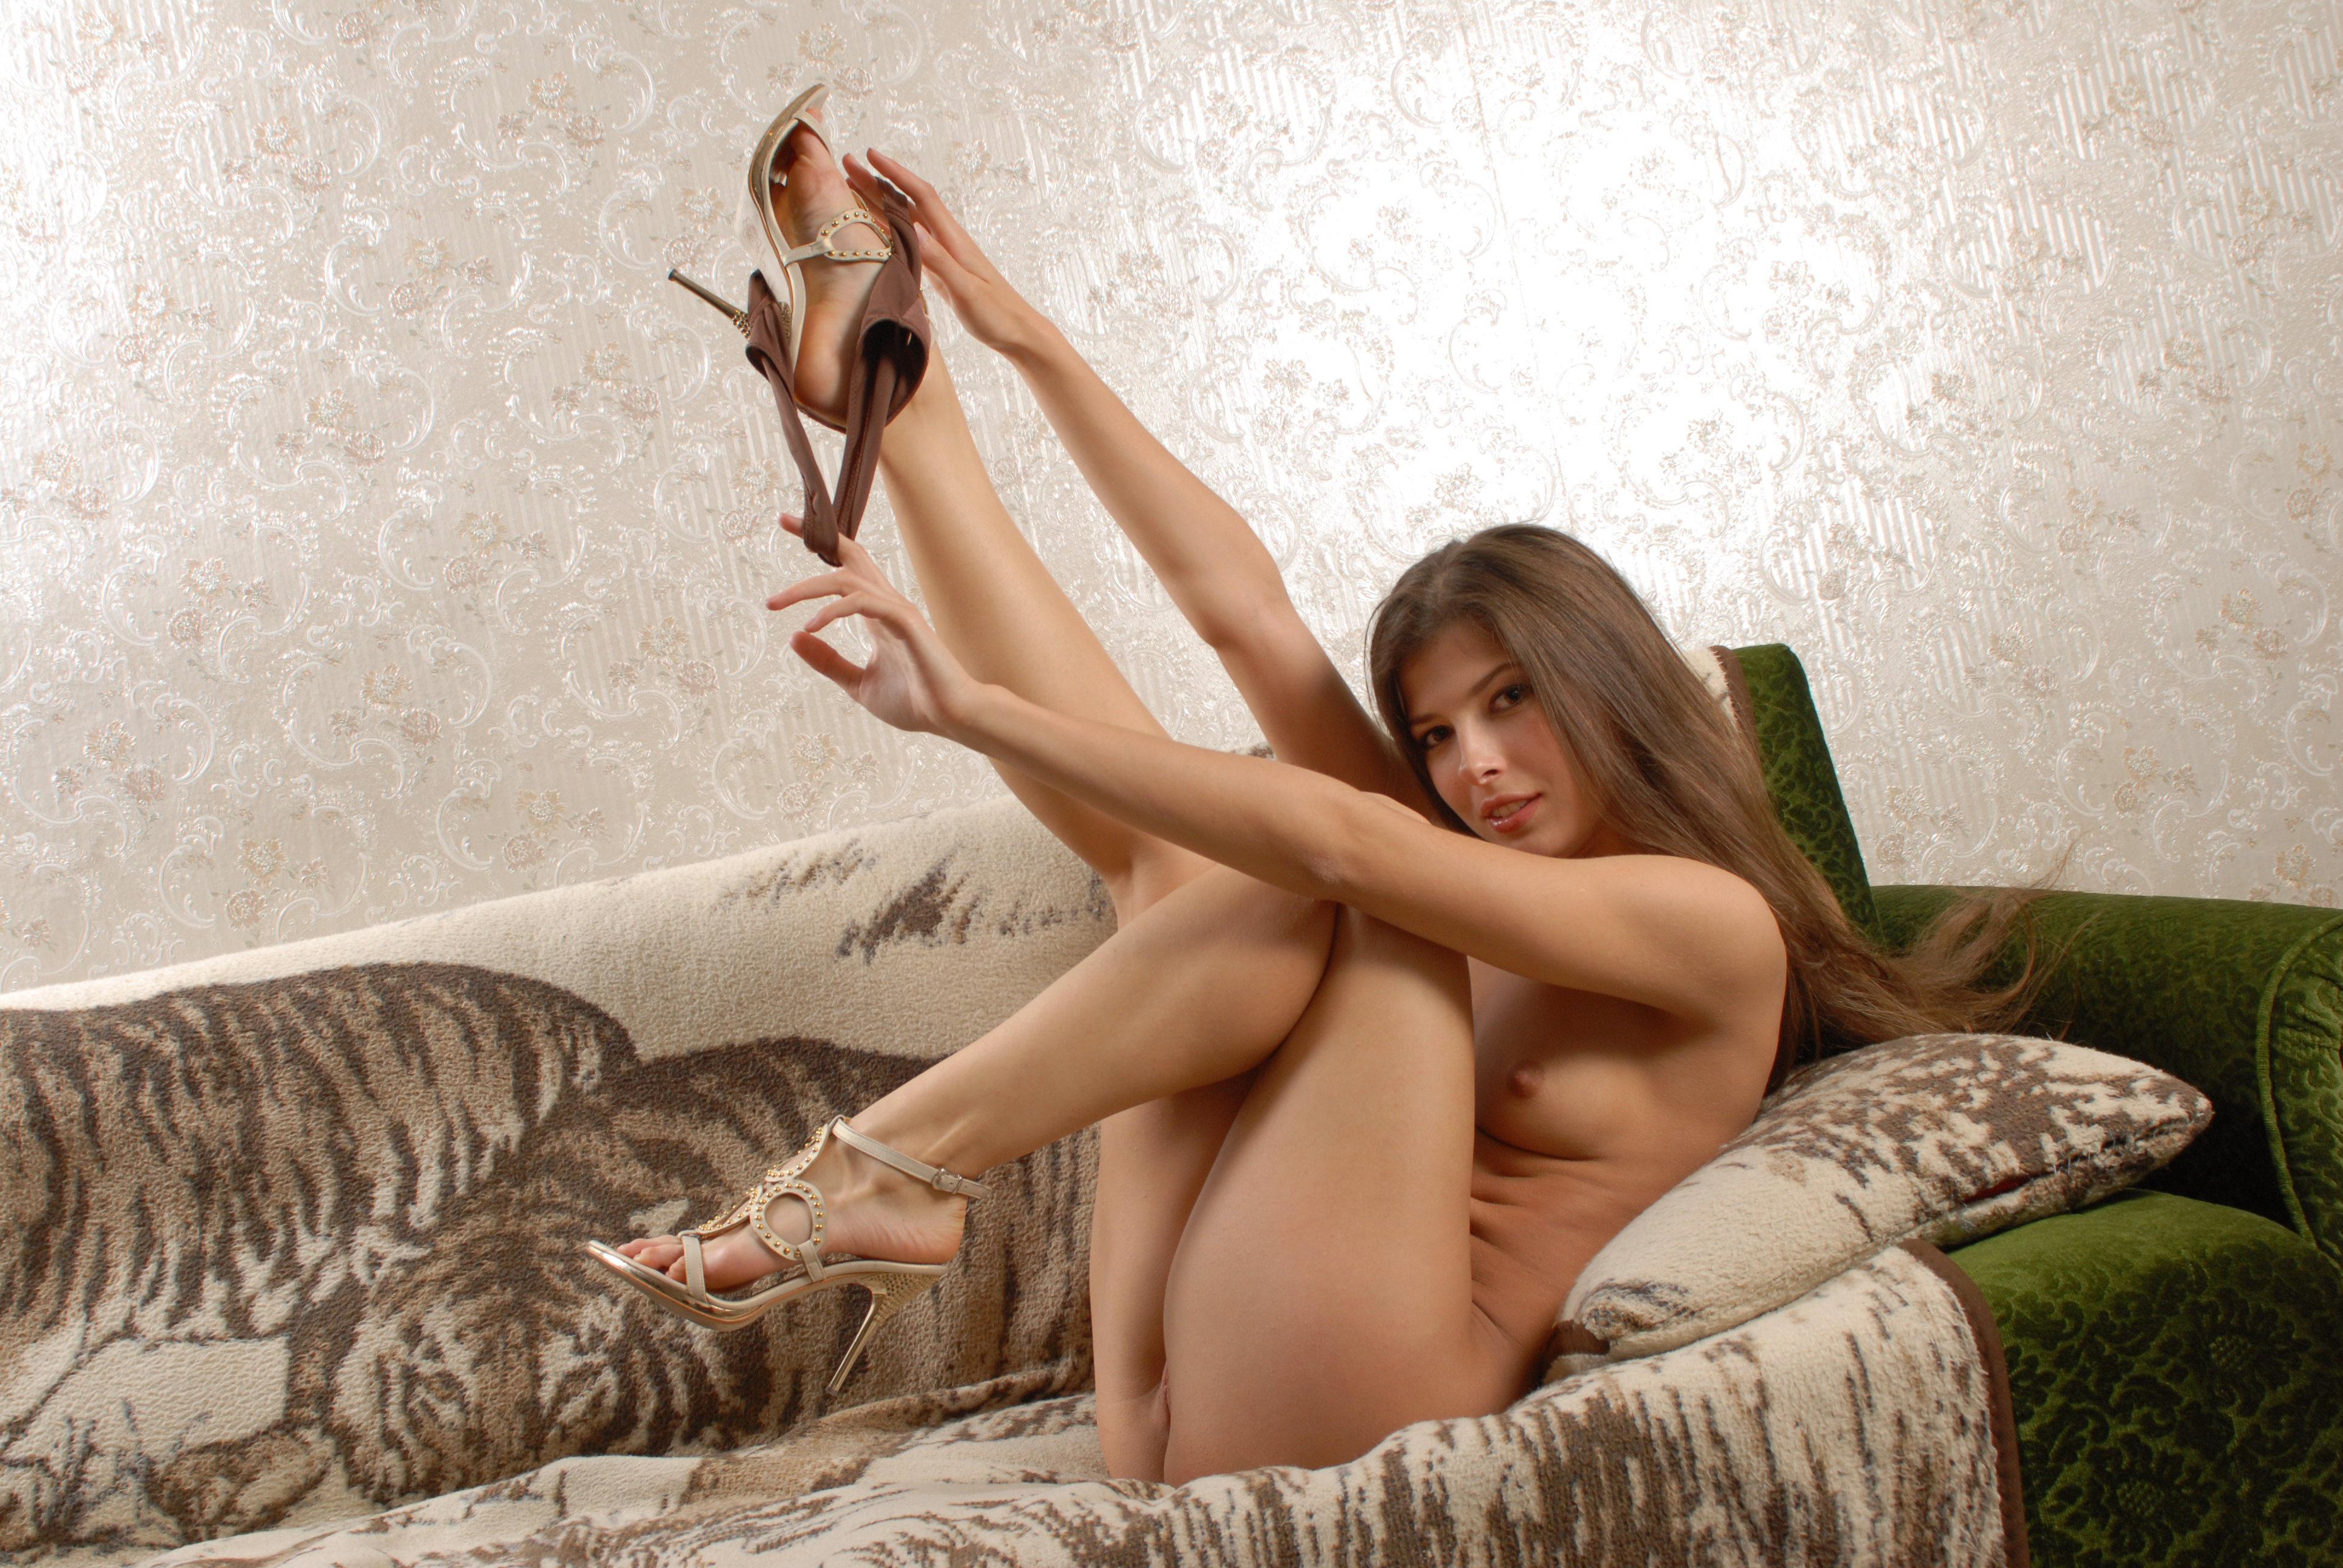 Эротика дома на диване, Порно На диване -видео. Смотреть порно онлайн! 10 фотография